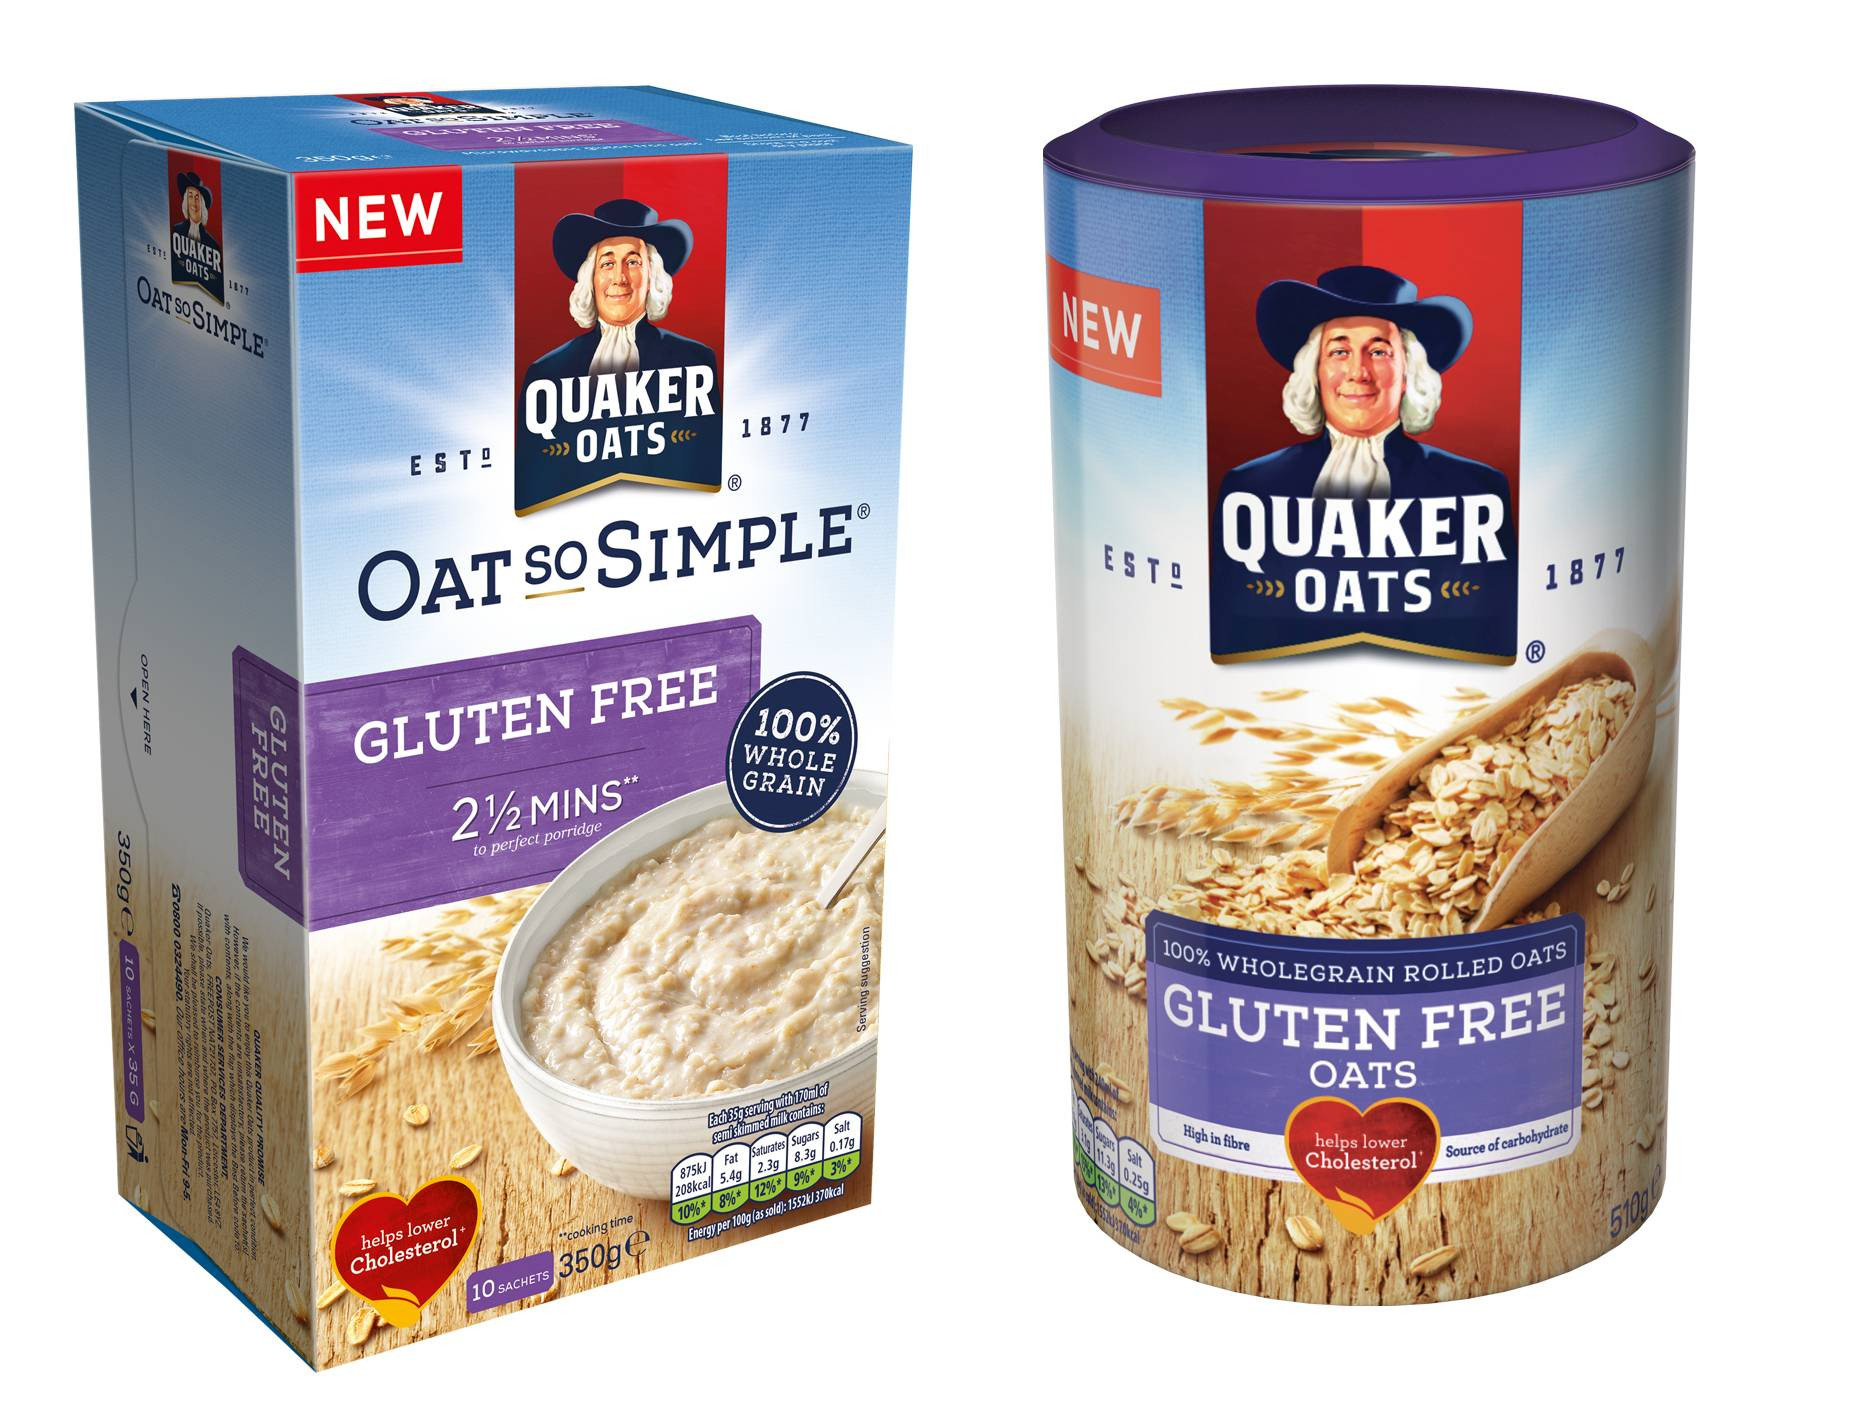 Are Quaker Old Fashioned Oats Gluten Free  Do quaker old fashioned oats have gluten